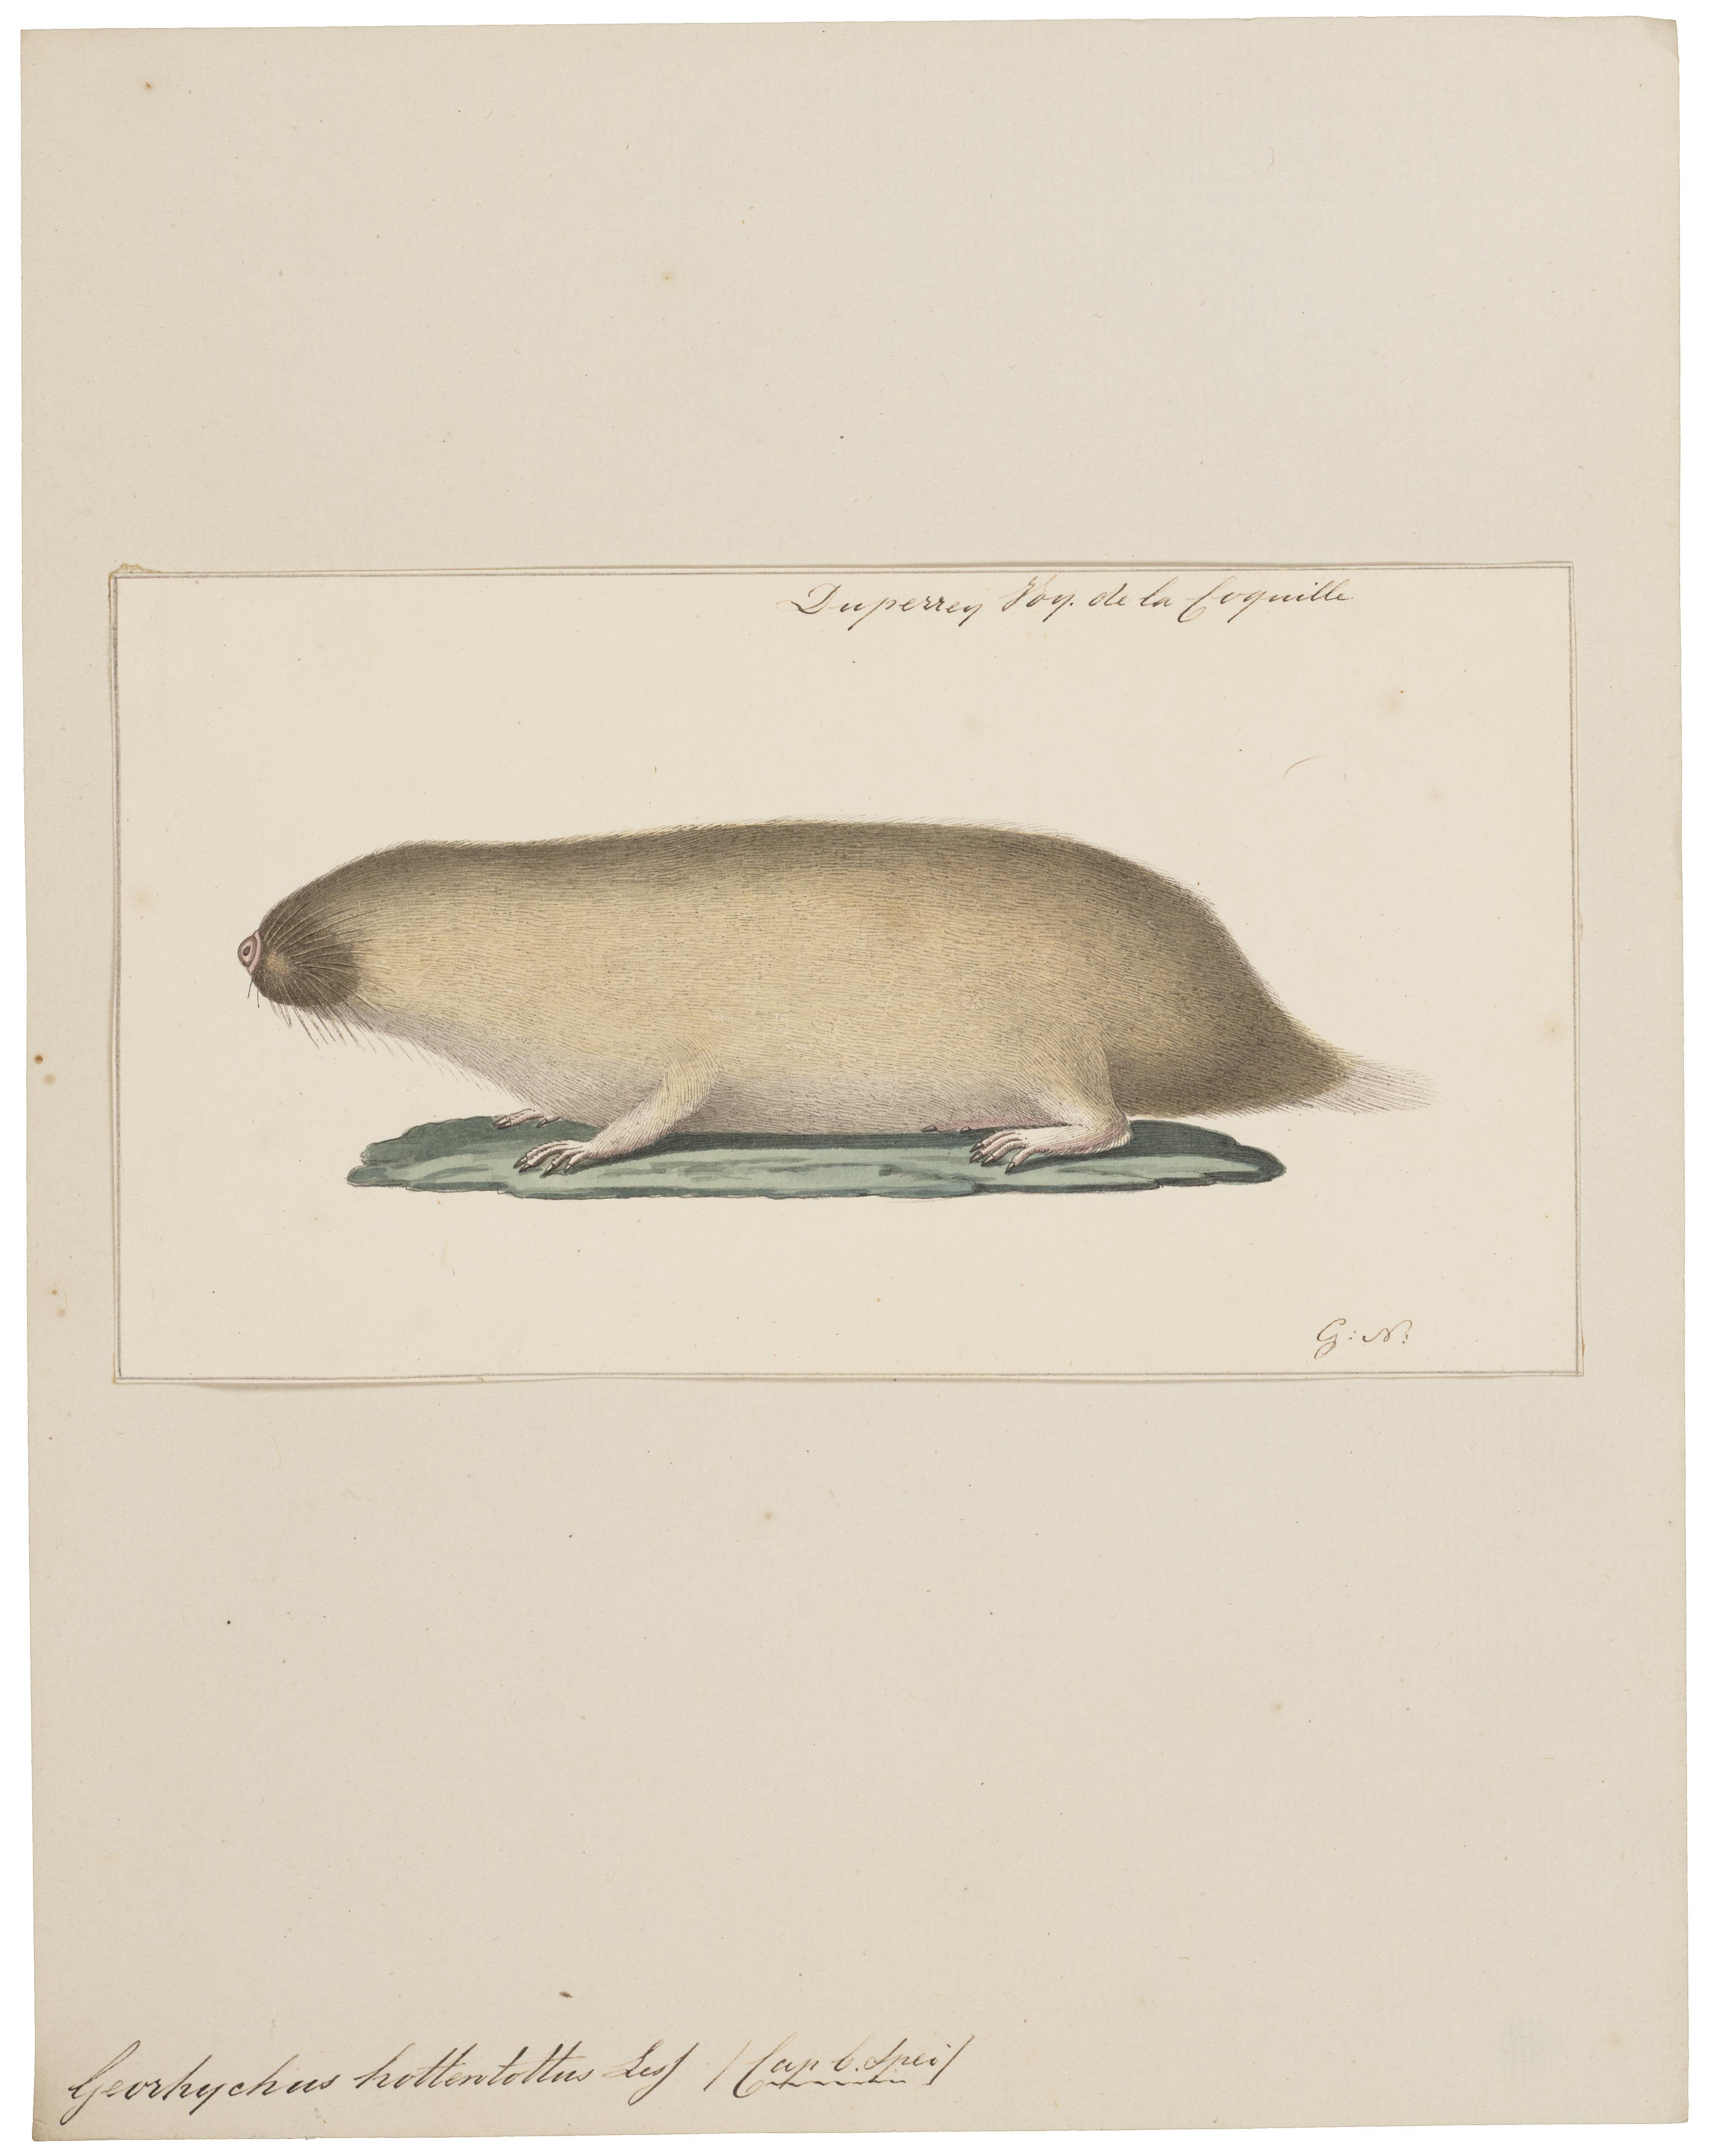 Image of African Mole Rat